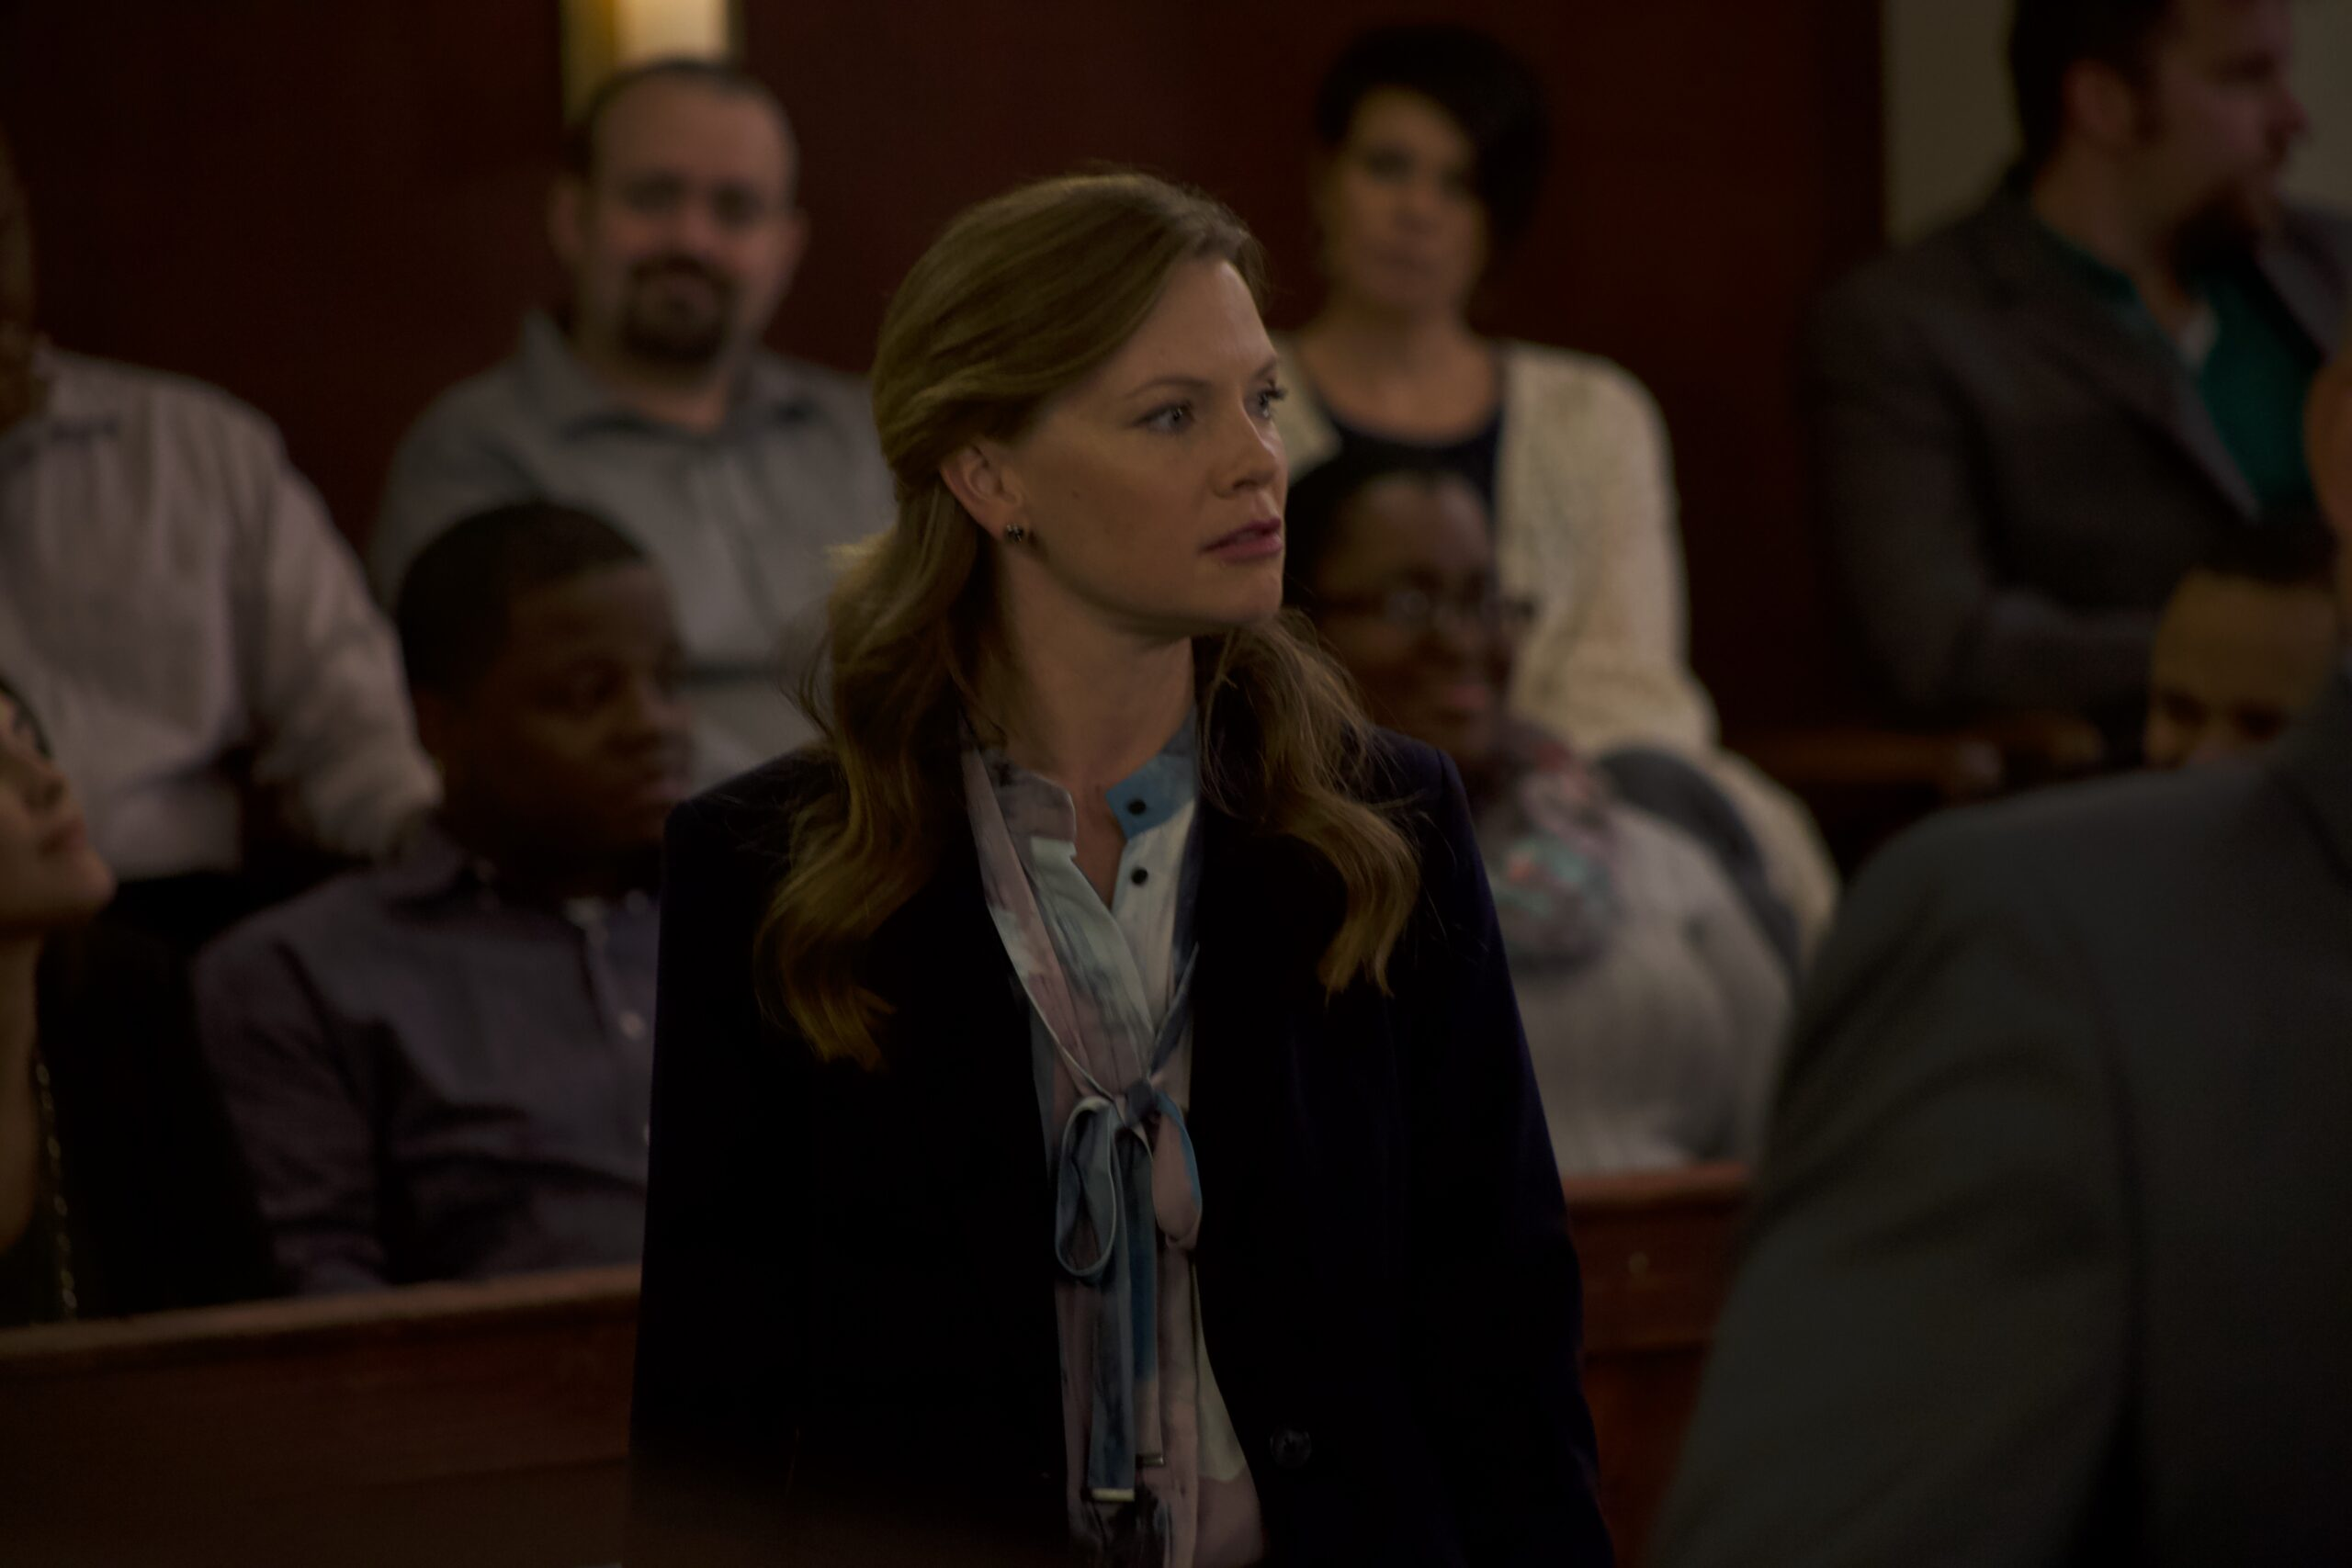 Sarah Jane Morris as Assistant District Attorney Lexi McGuire gosnellmovie.com